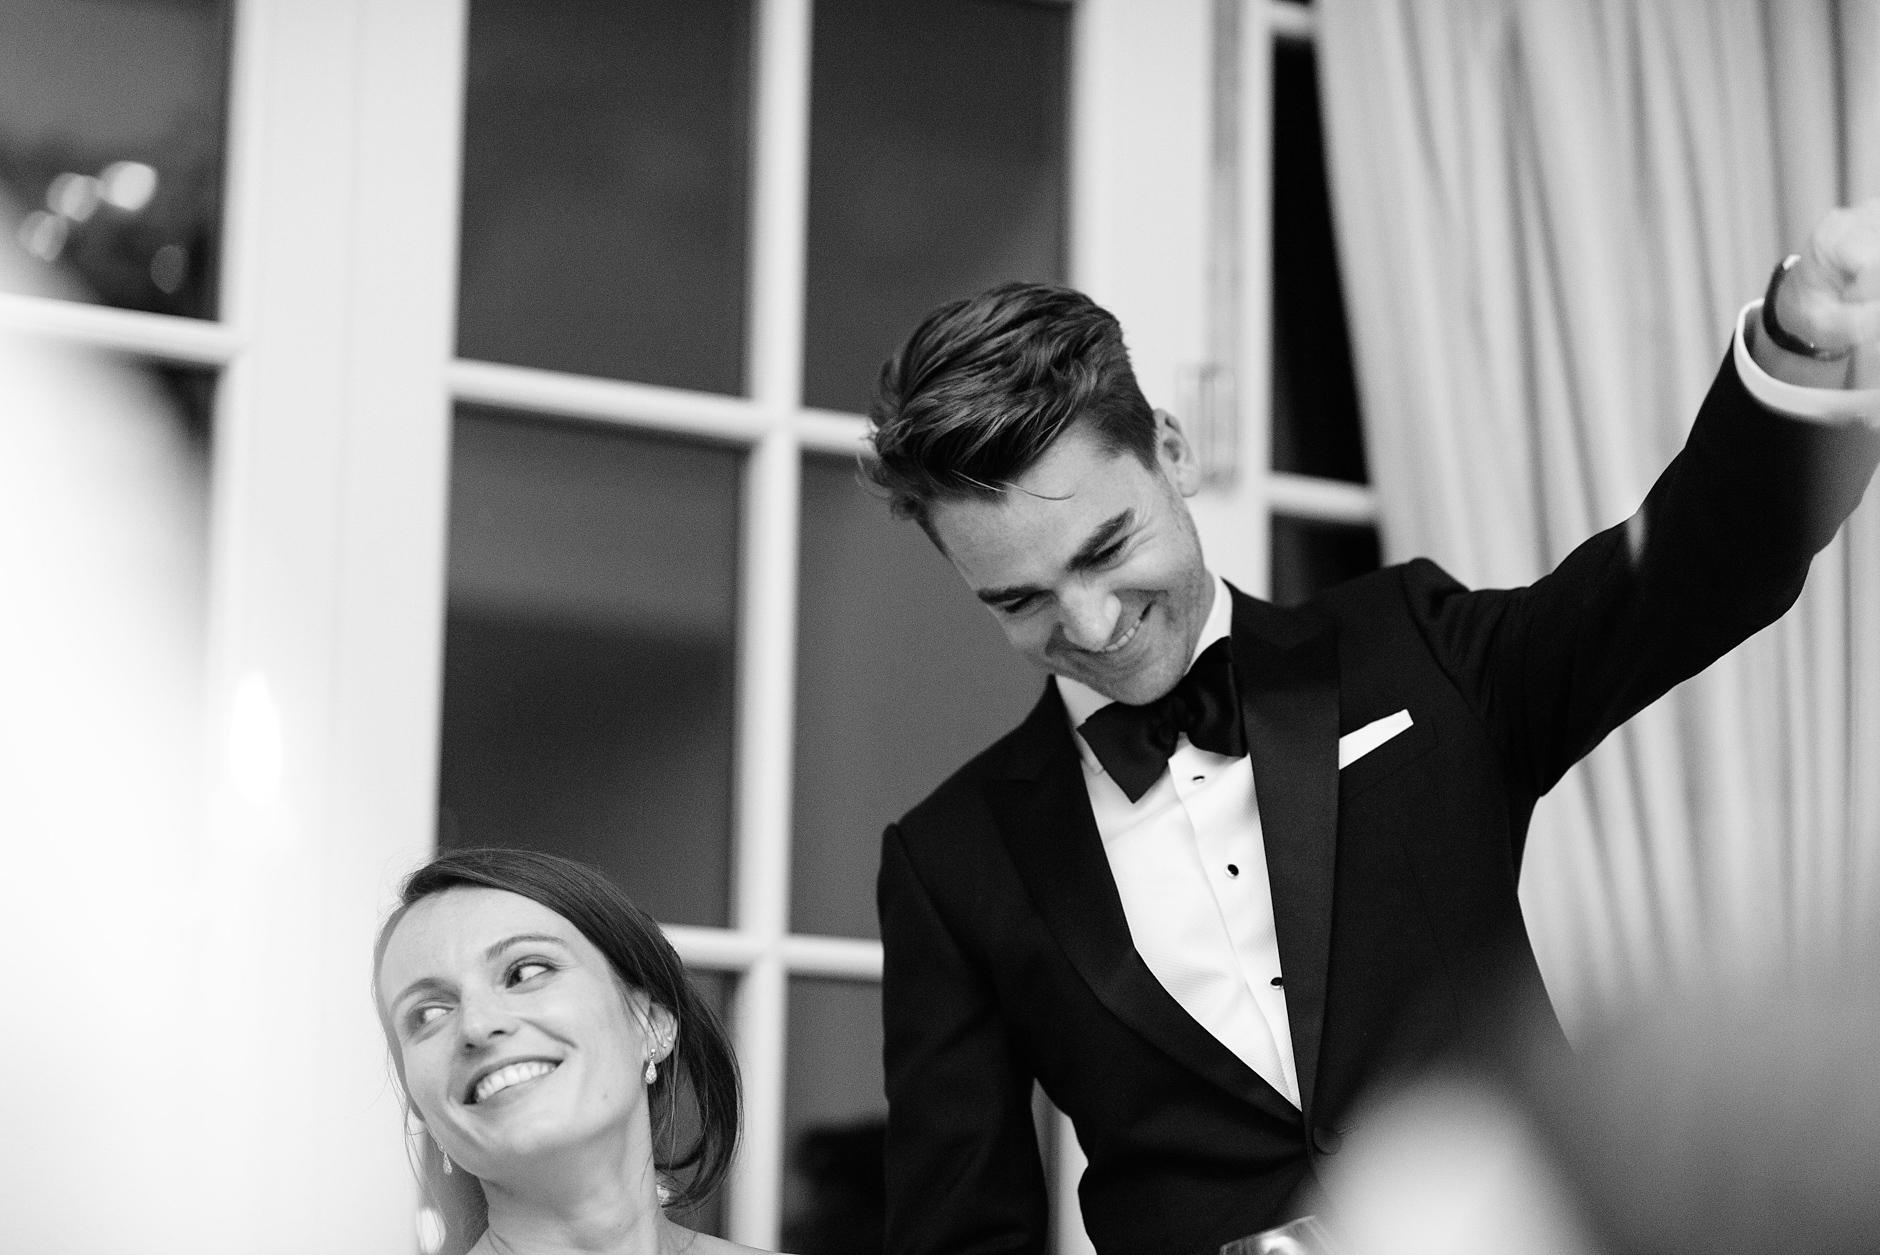 Glentruim-Wedding-Nikki-Leadbetter-Photography-297.jpg